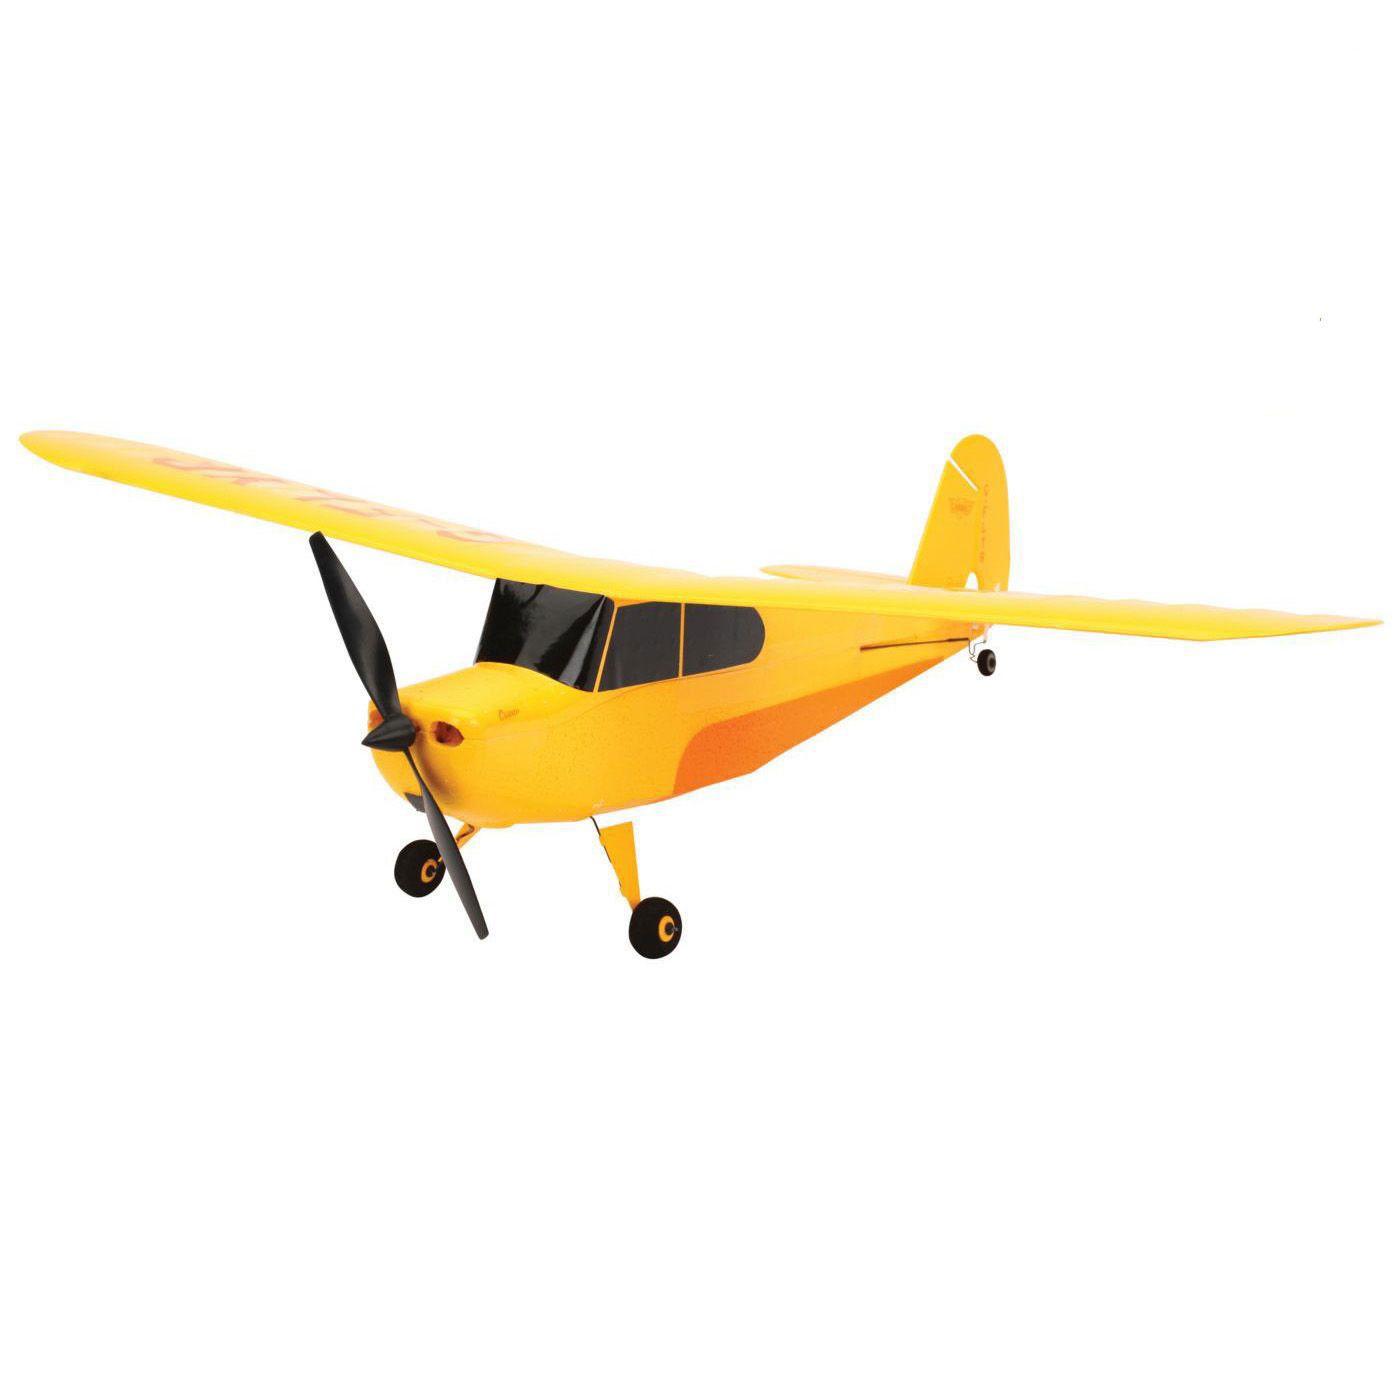 Радиоуправляемый самолет HobbyZone Champ 2.4G, электро, RTF радиоуправляемый самолет hobbyzone delta ray технология safe